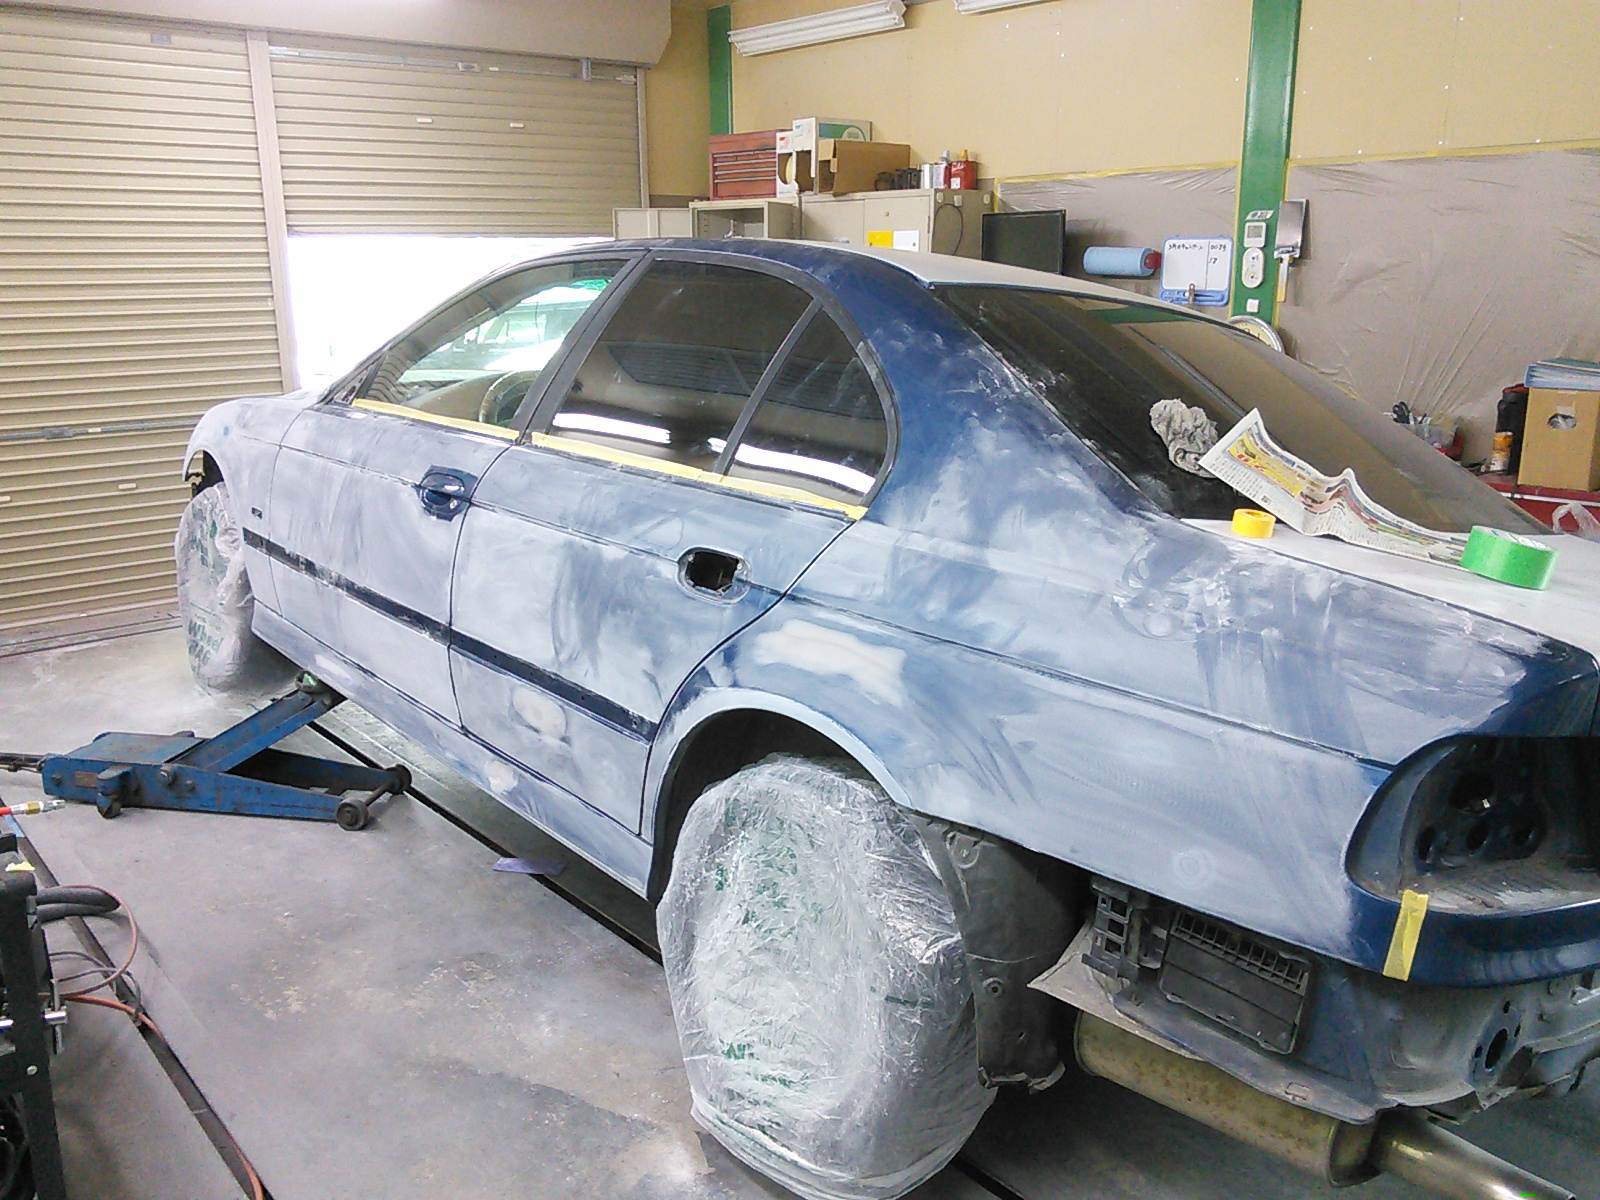 BMW  E39 全塗装 しながらBMW バンパー修理  豊田市  板金塗装